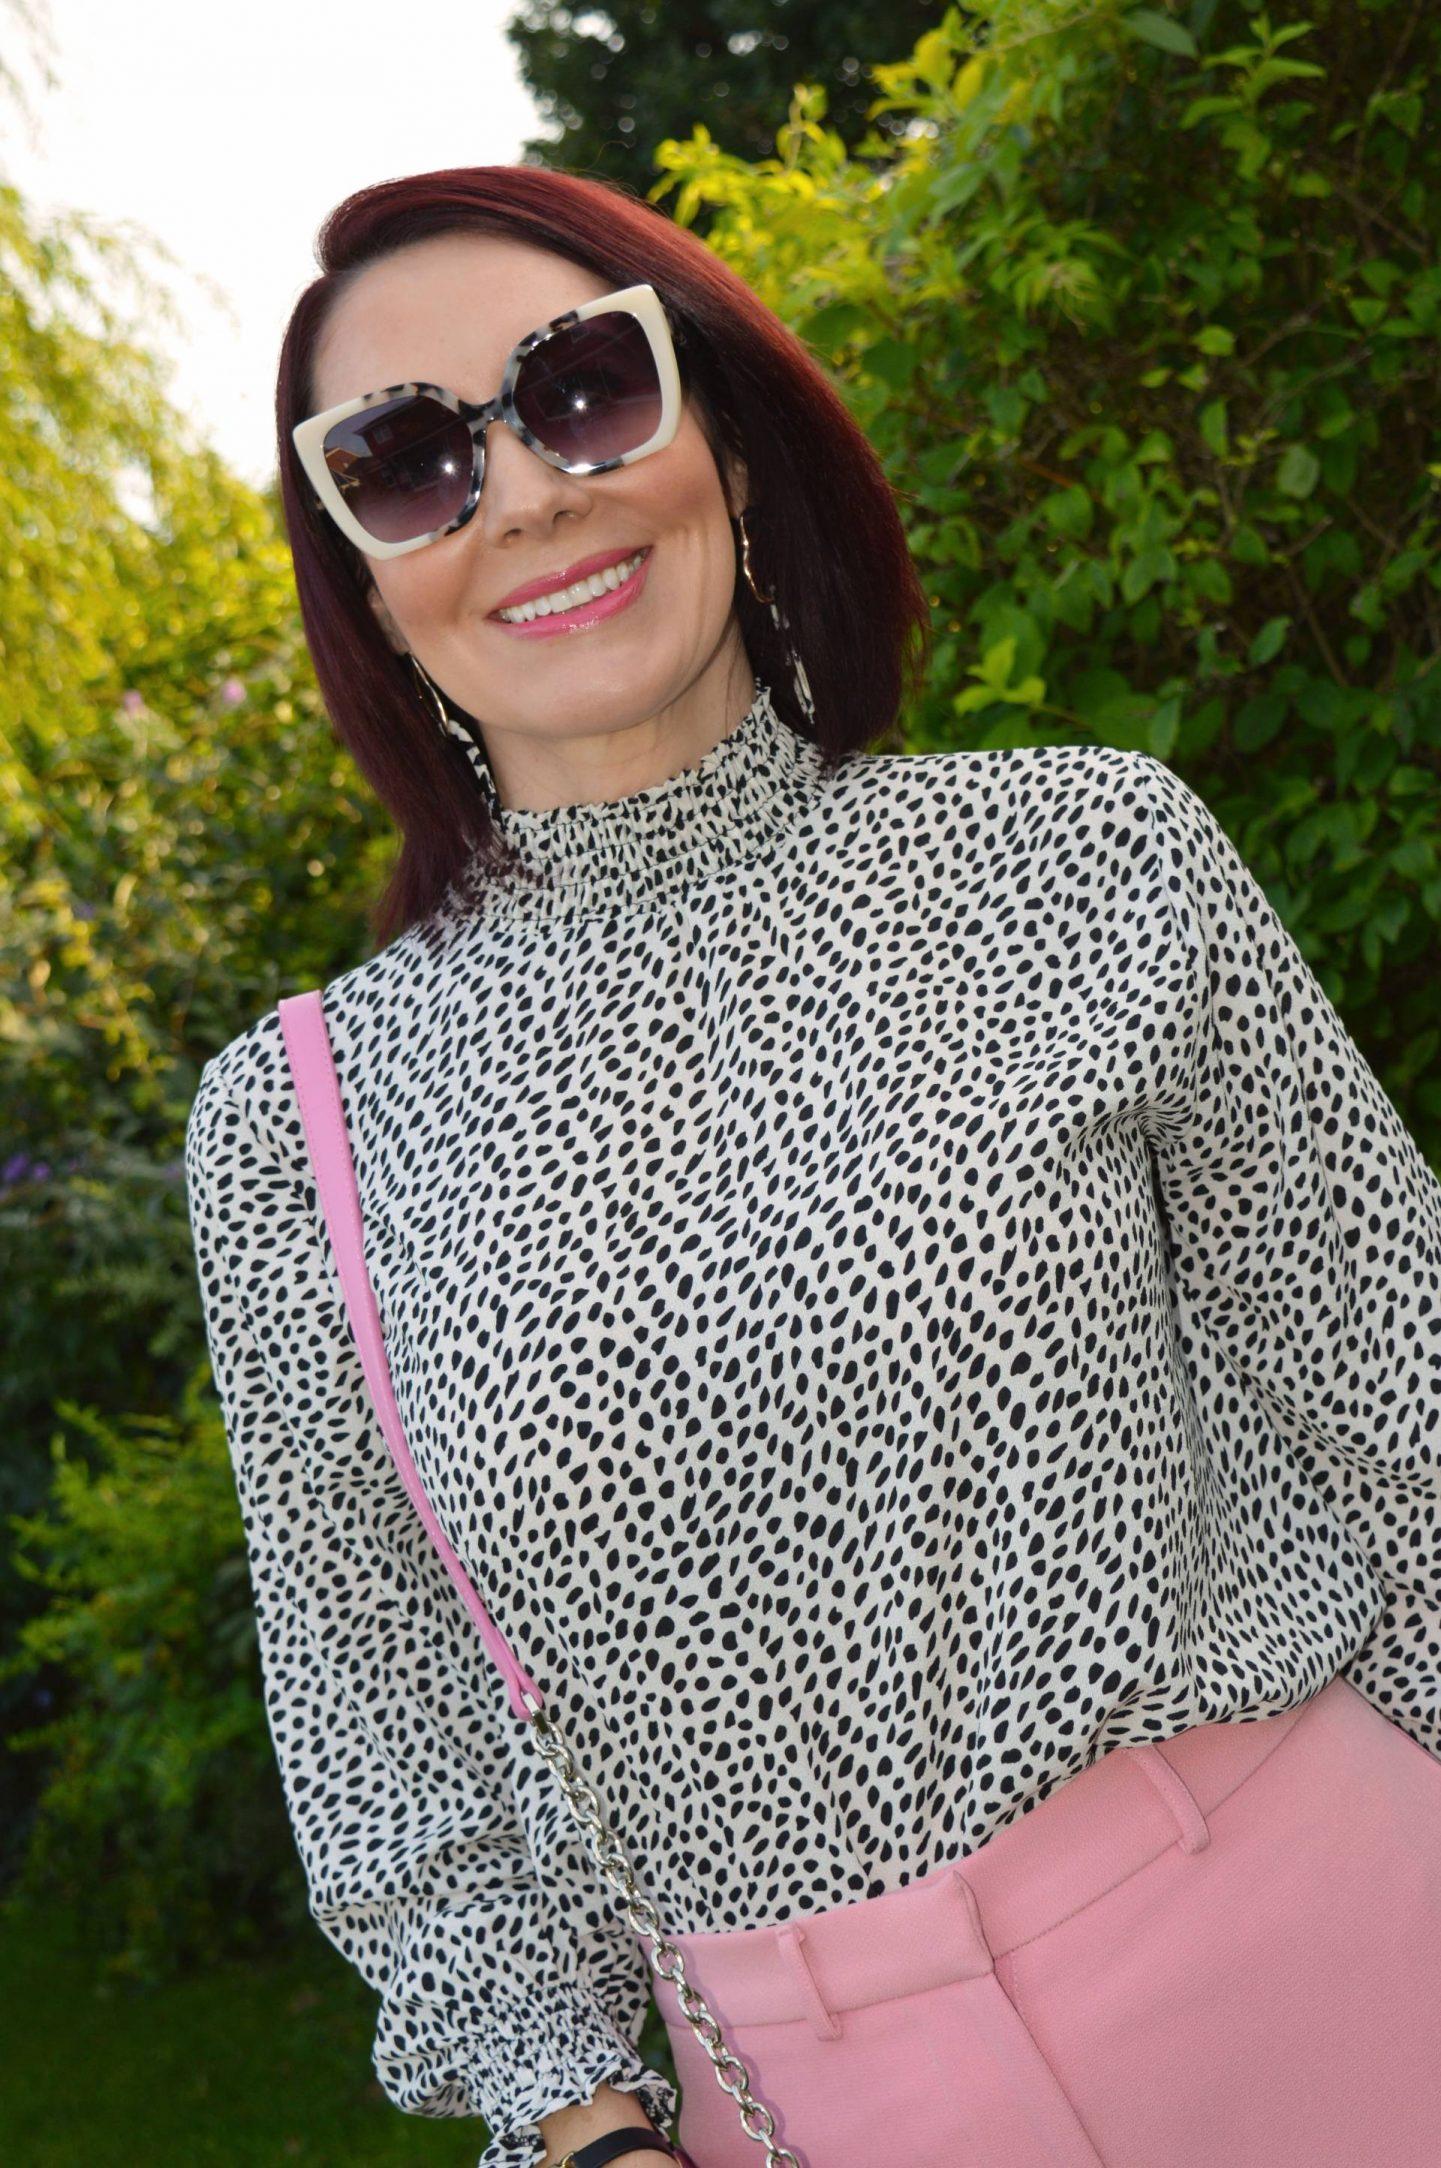 Coast shirred polka dot neck smock top, Oliver Bonas white and tortoiseshell sunglasses